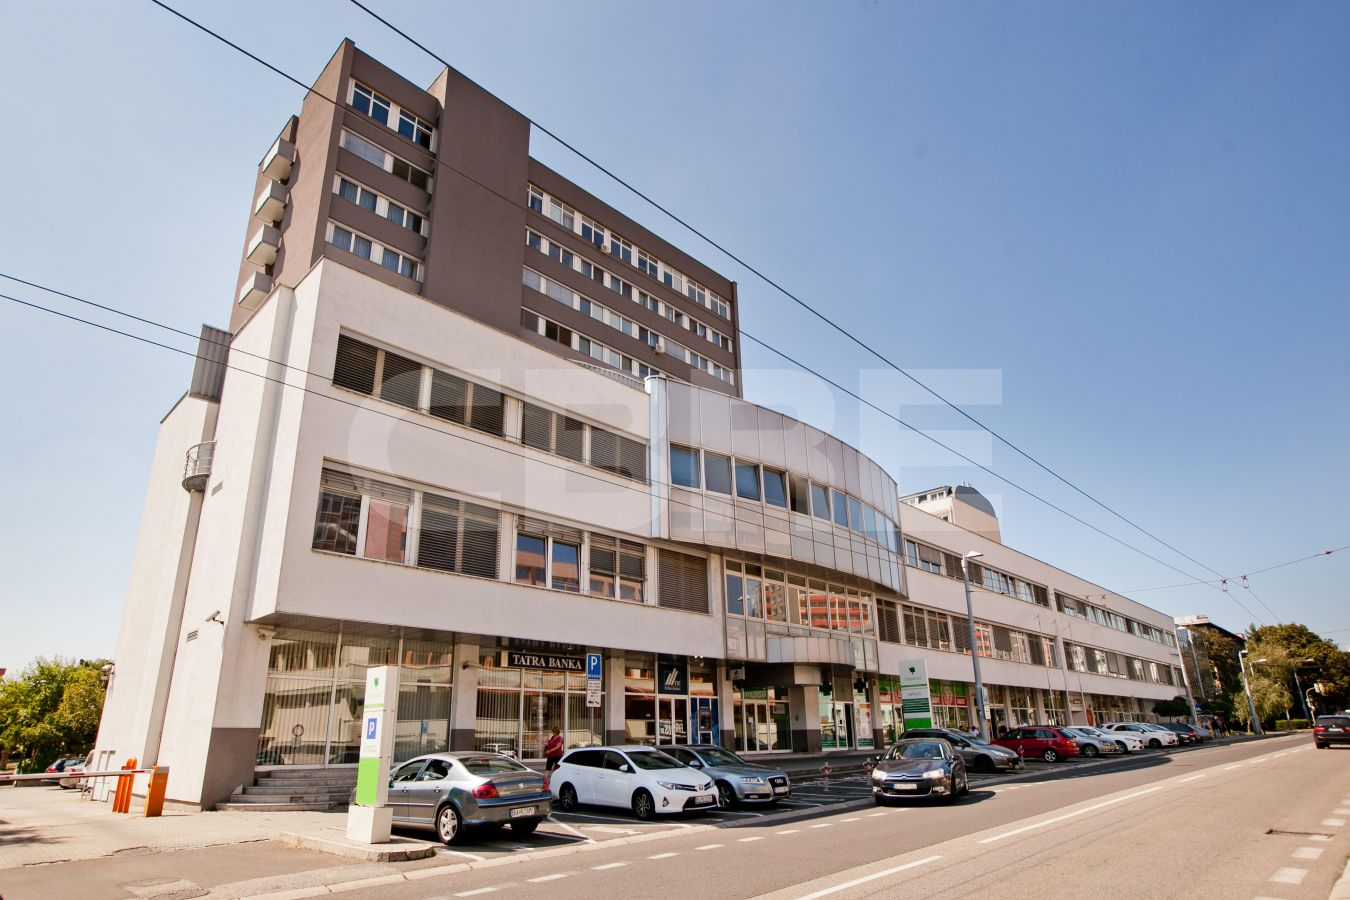 Stromová 9, Bratislava - Rača | Offices for rent by CBRE | 2